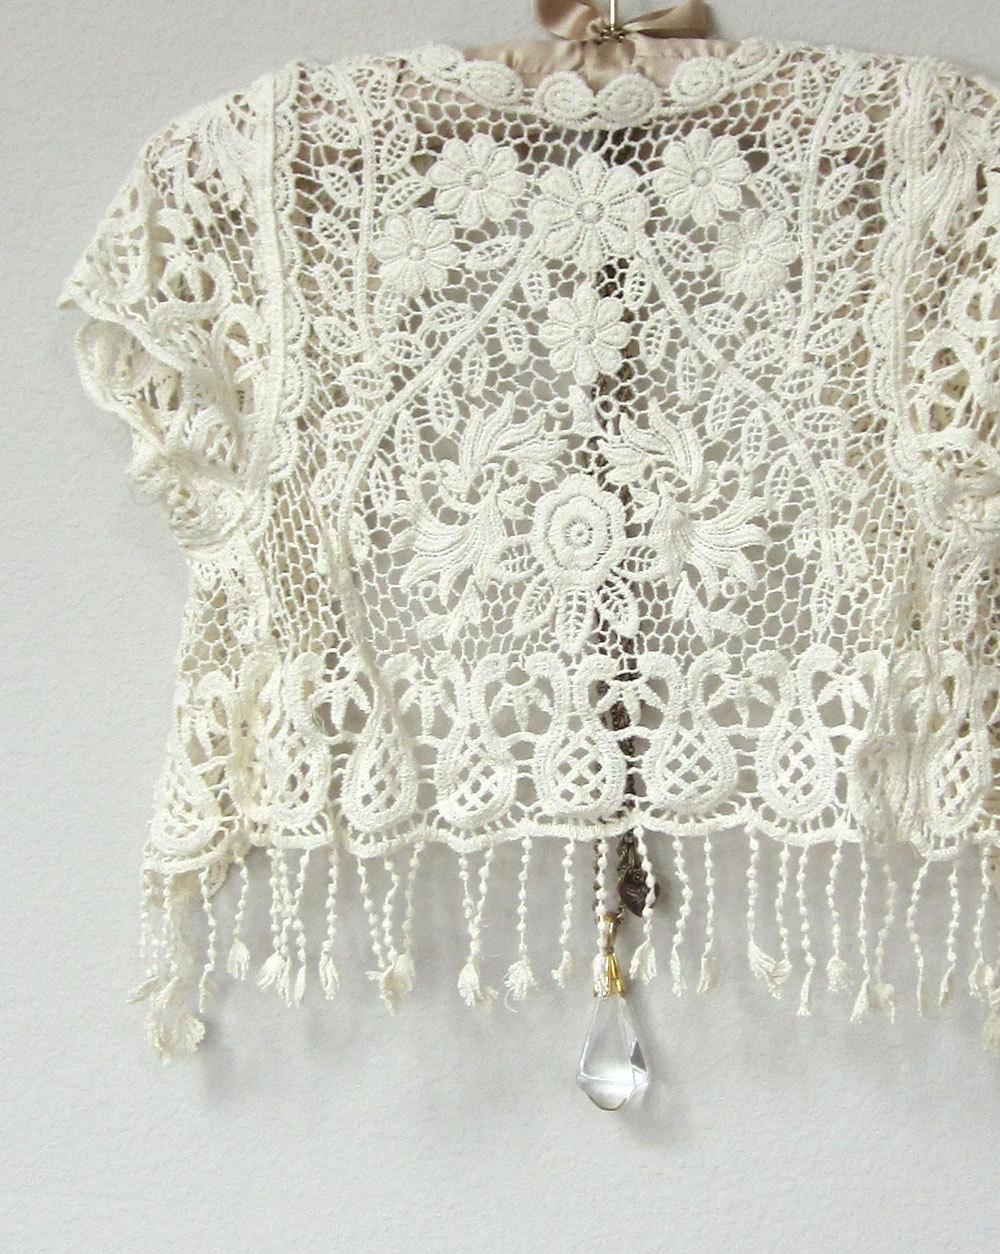 5755c7a341171 ... Beautiful Ivory White Crochet Short Sleeve Capelet, Cover Up Jacket,  Vest with Fringe,